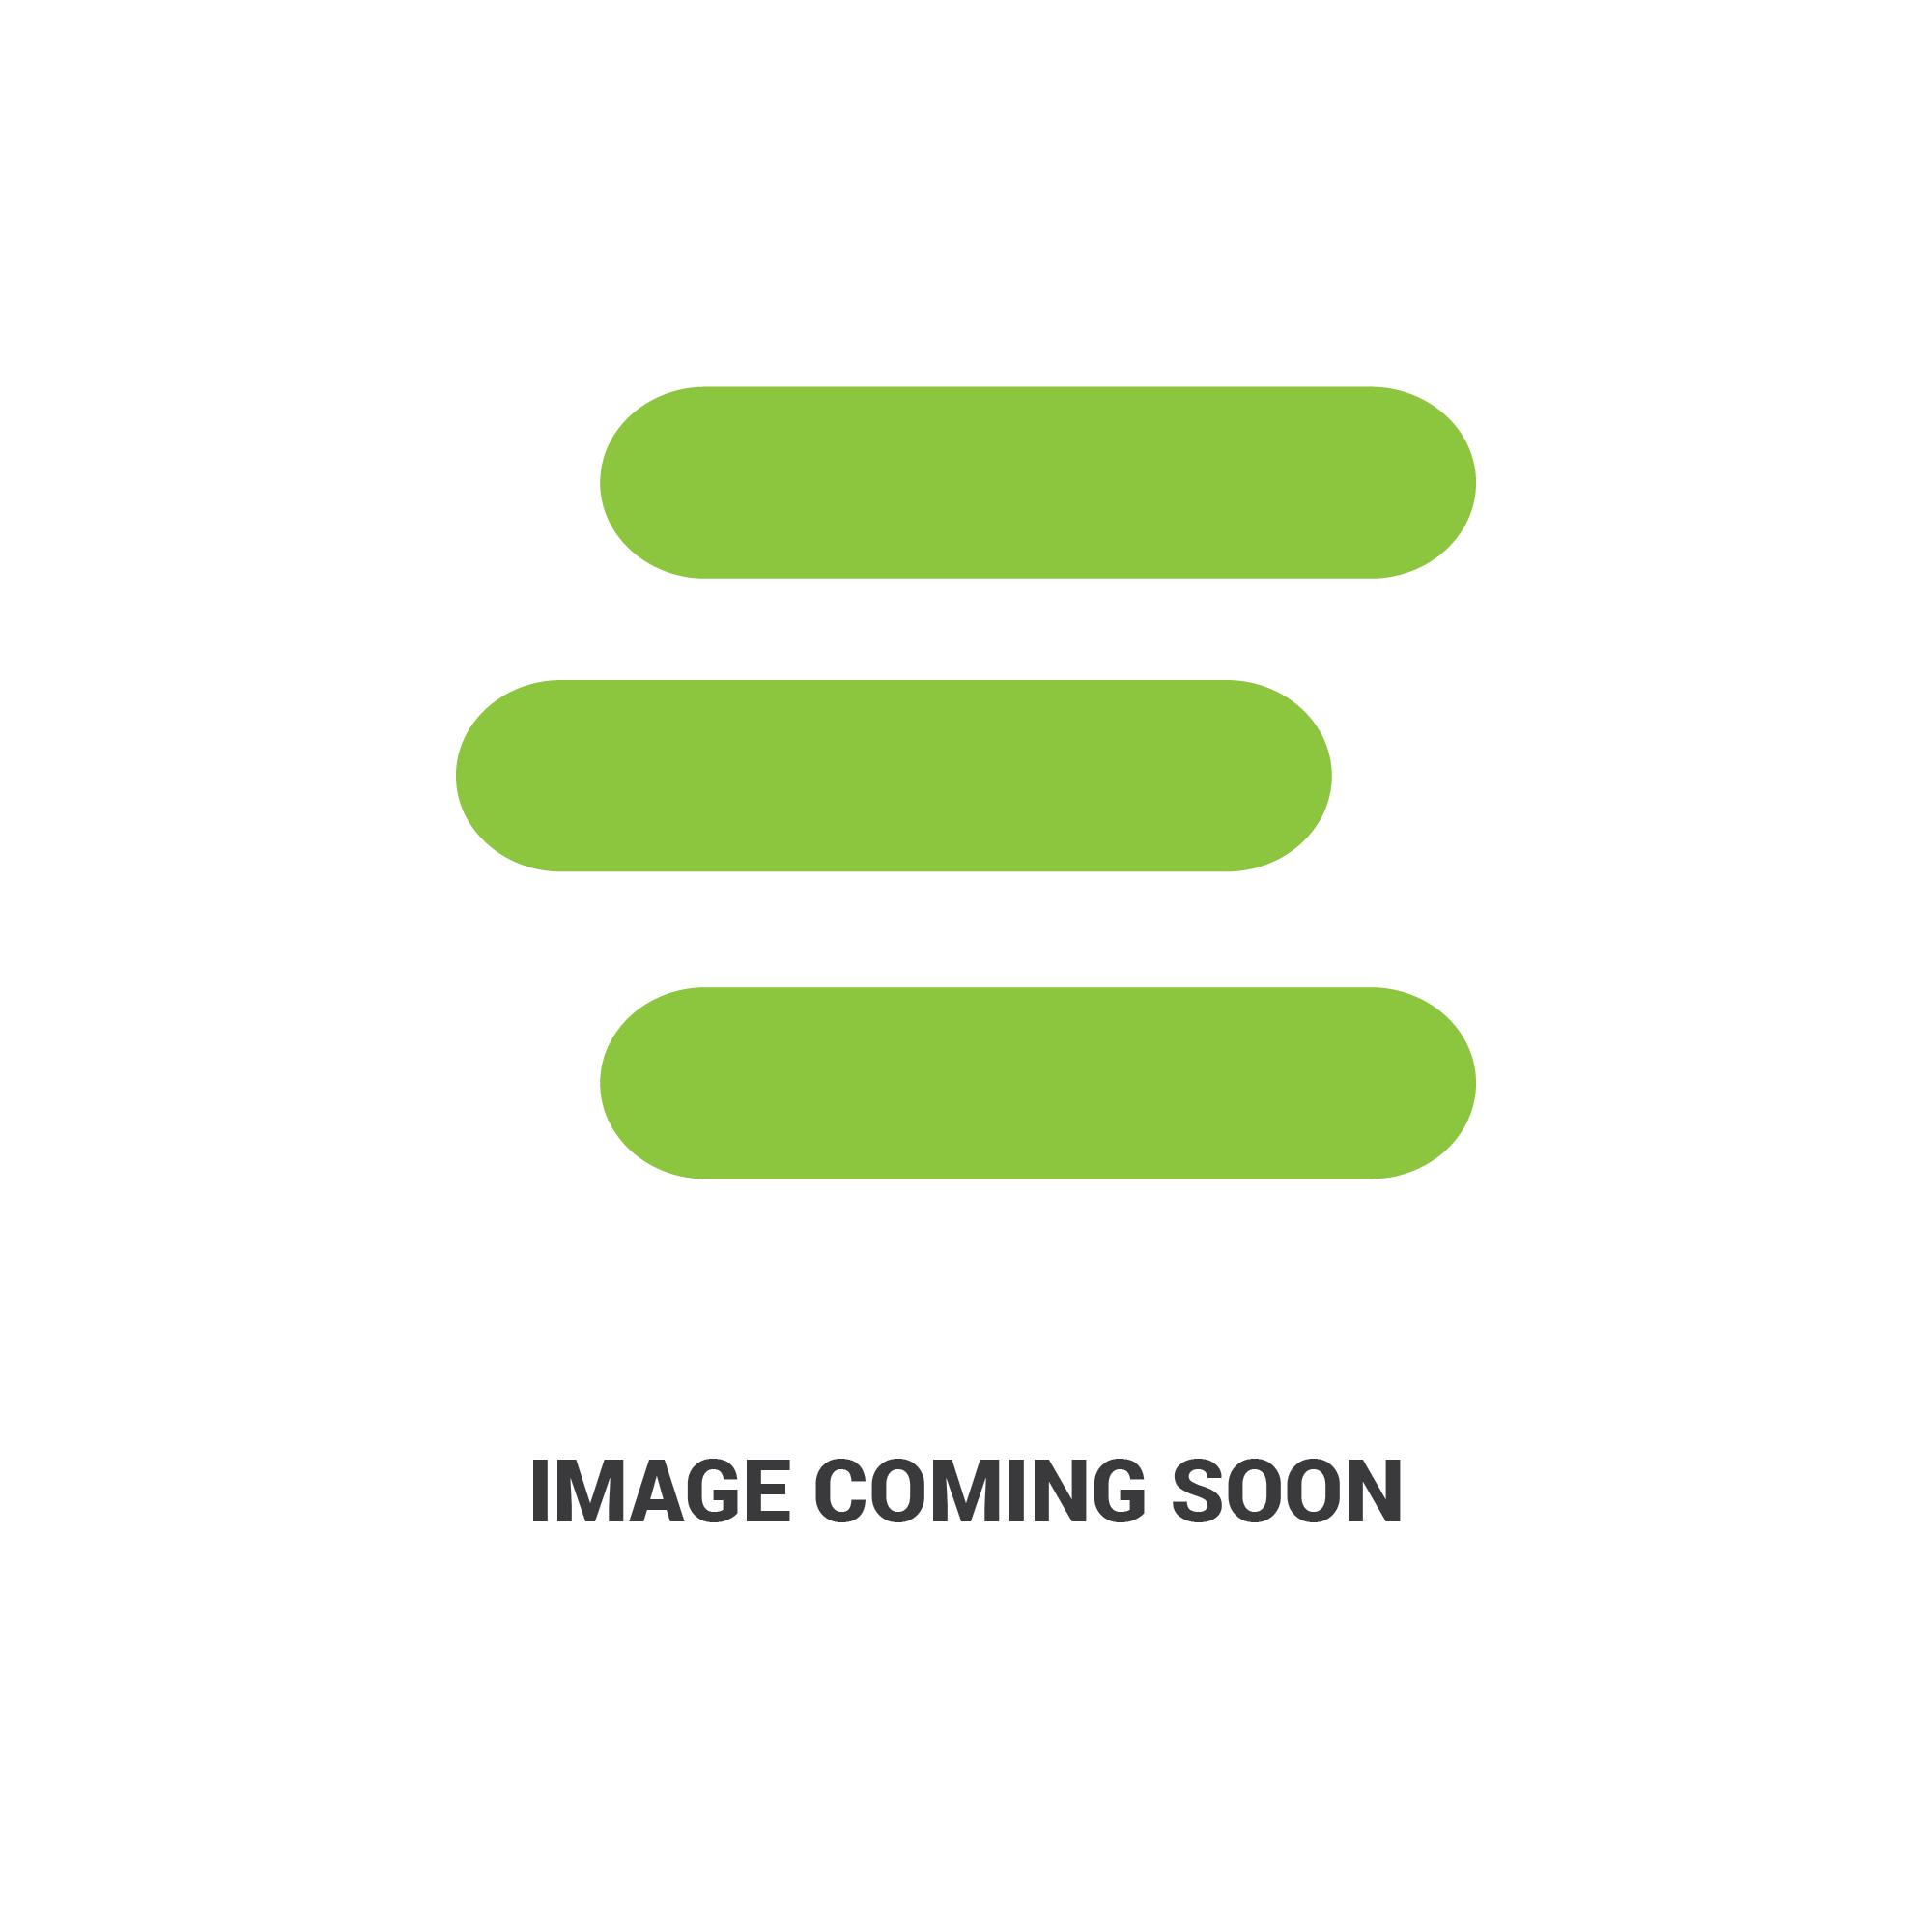 E-14M73032320_1 .jpg